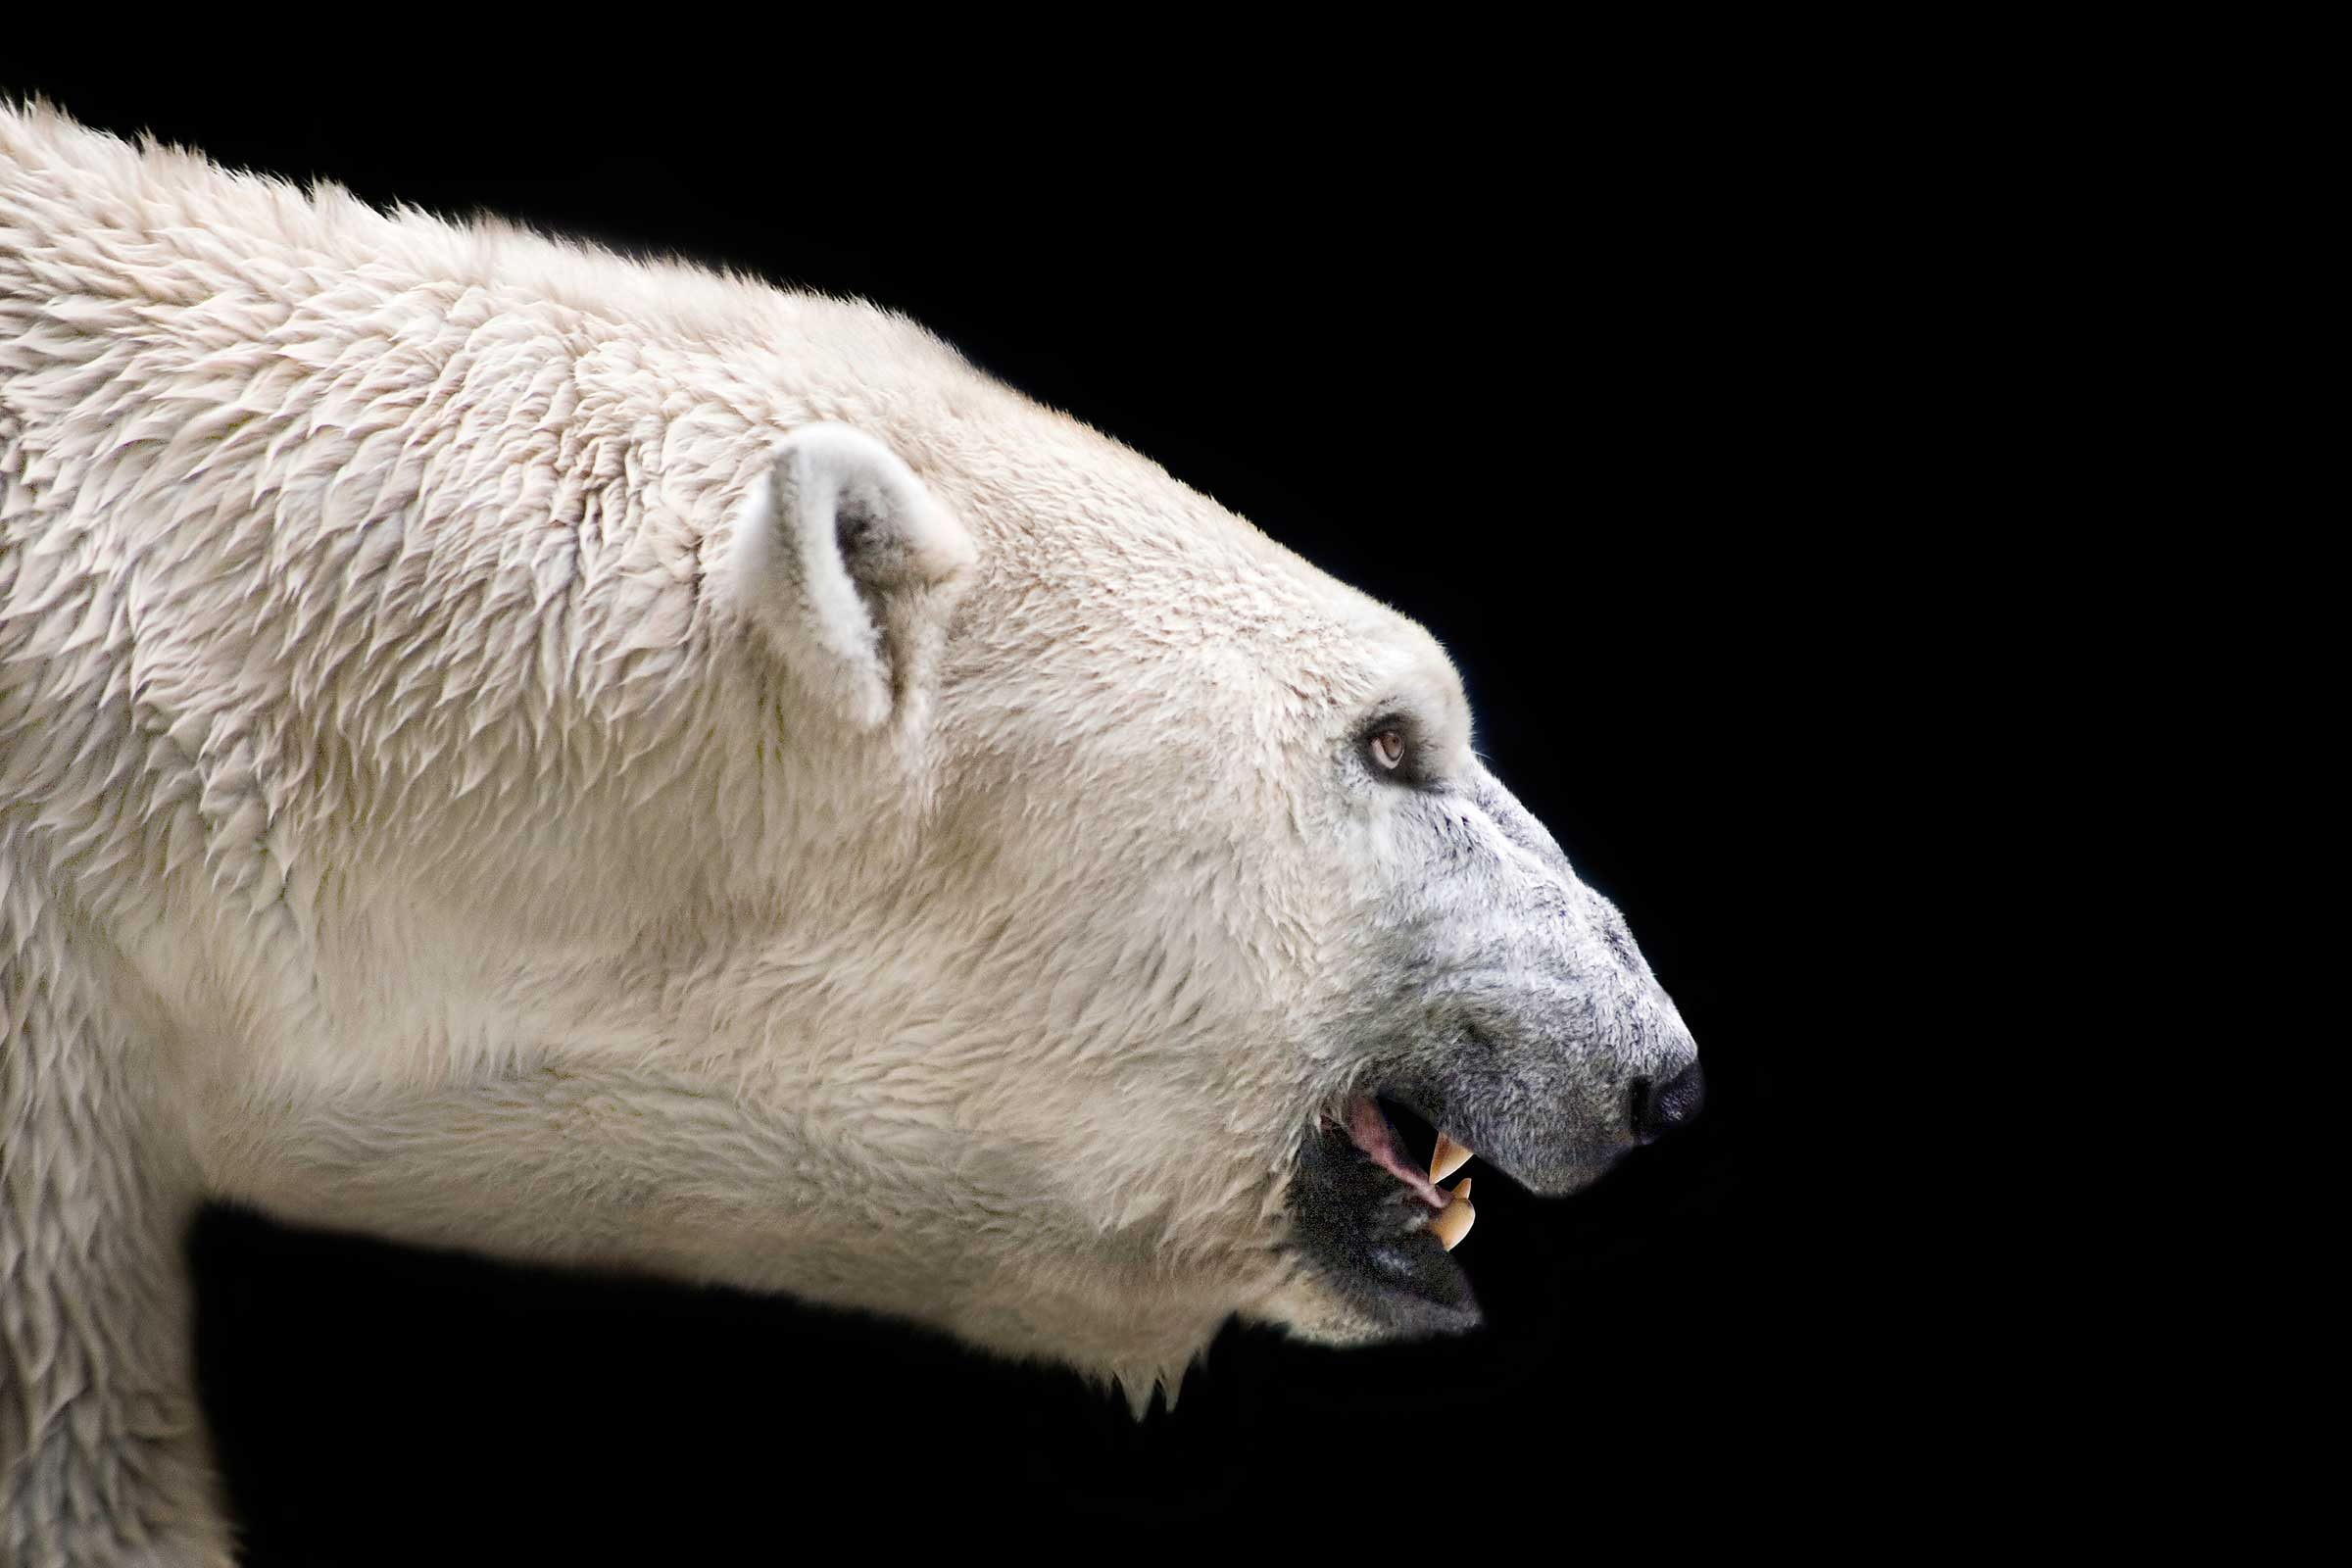 http://www.rd.com/wp-content/uploads/sites/2/2016/02/march-2016-polar-bear.jpg